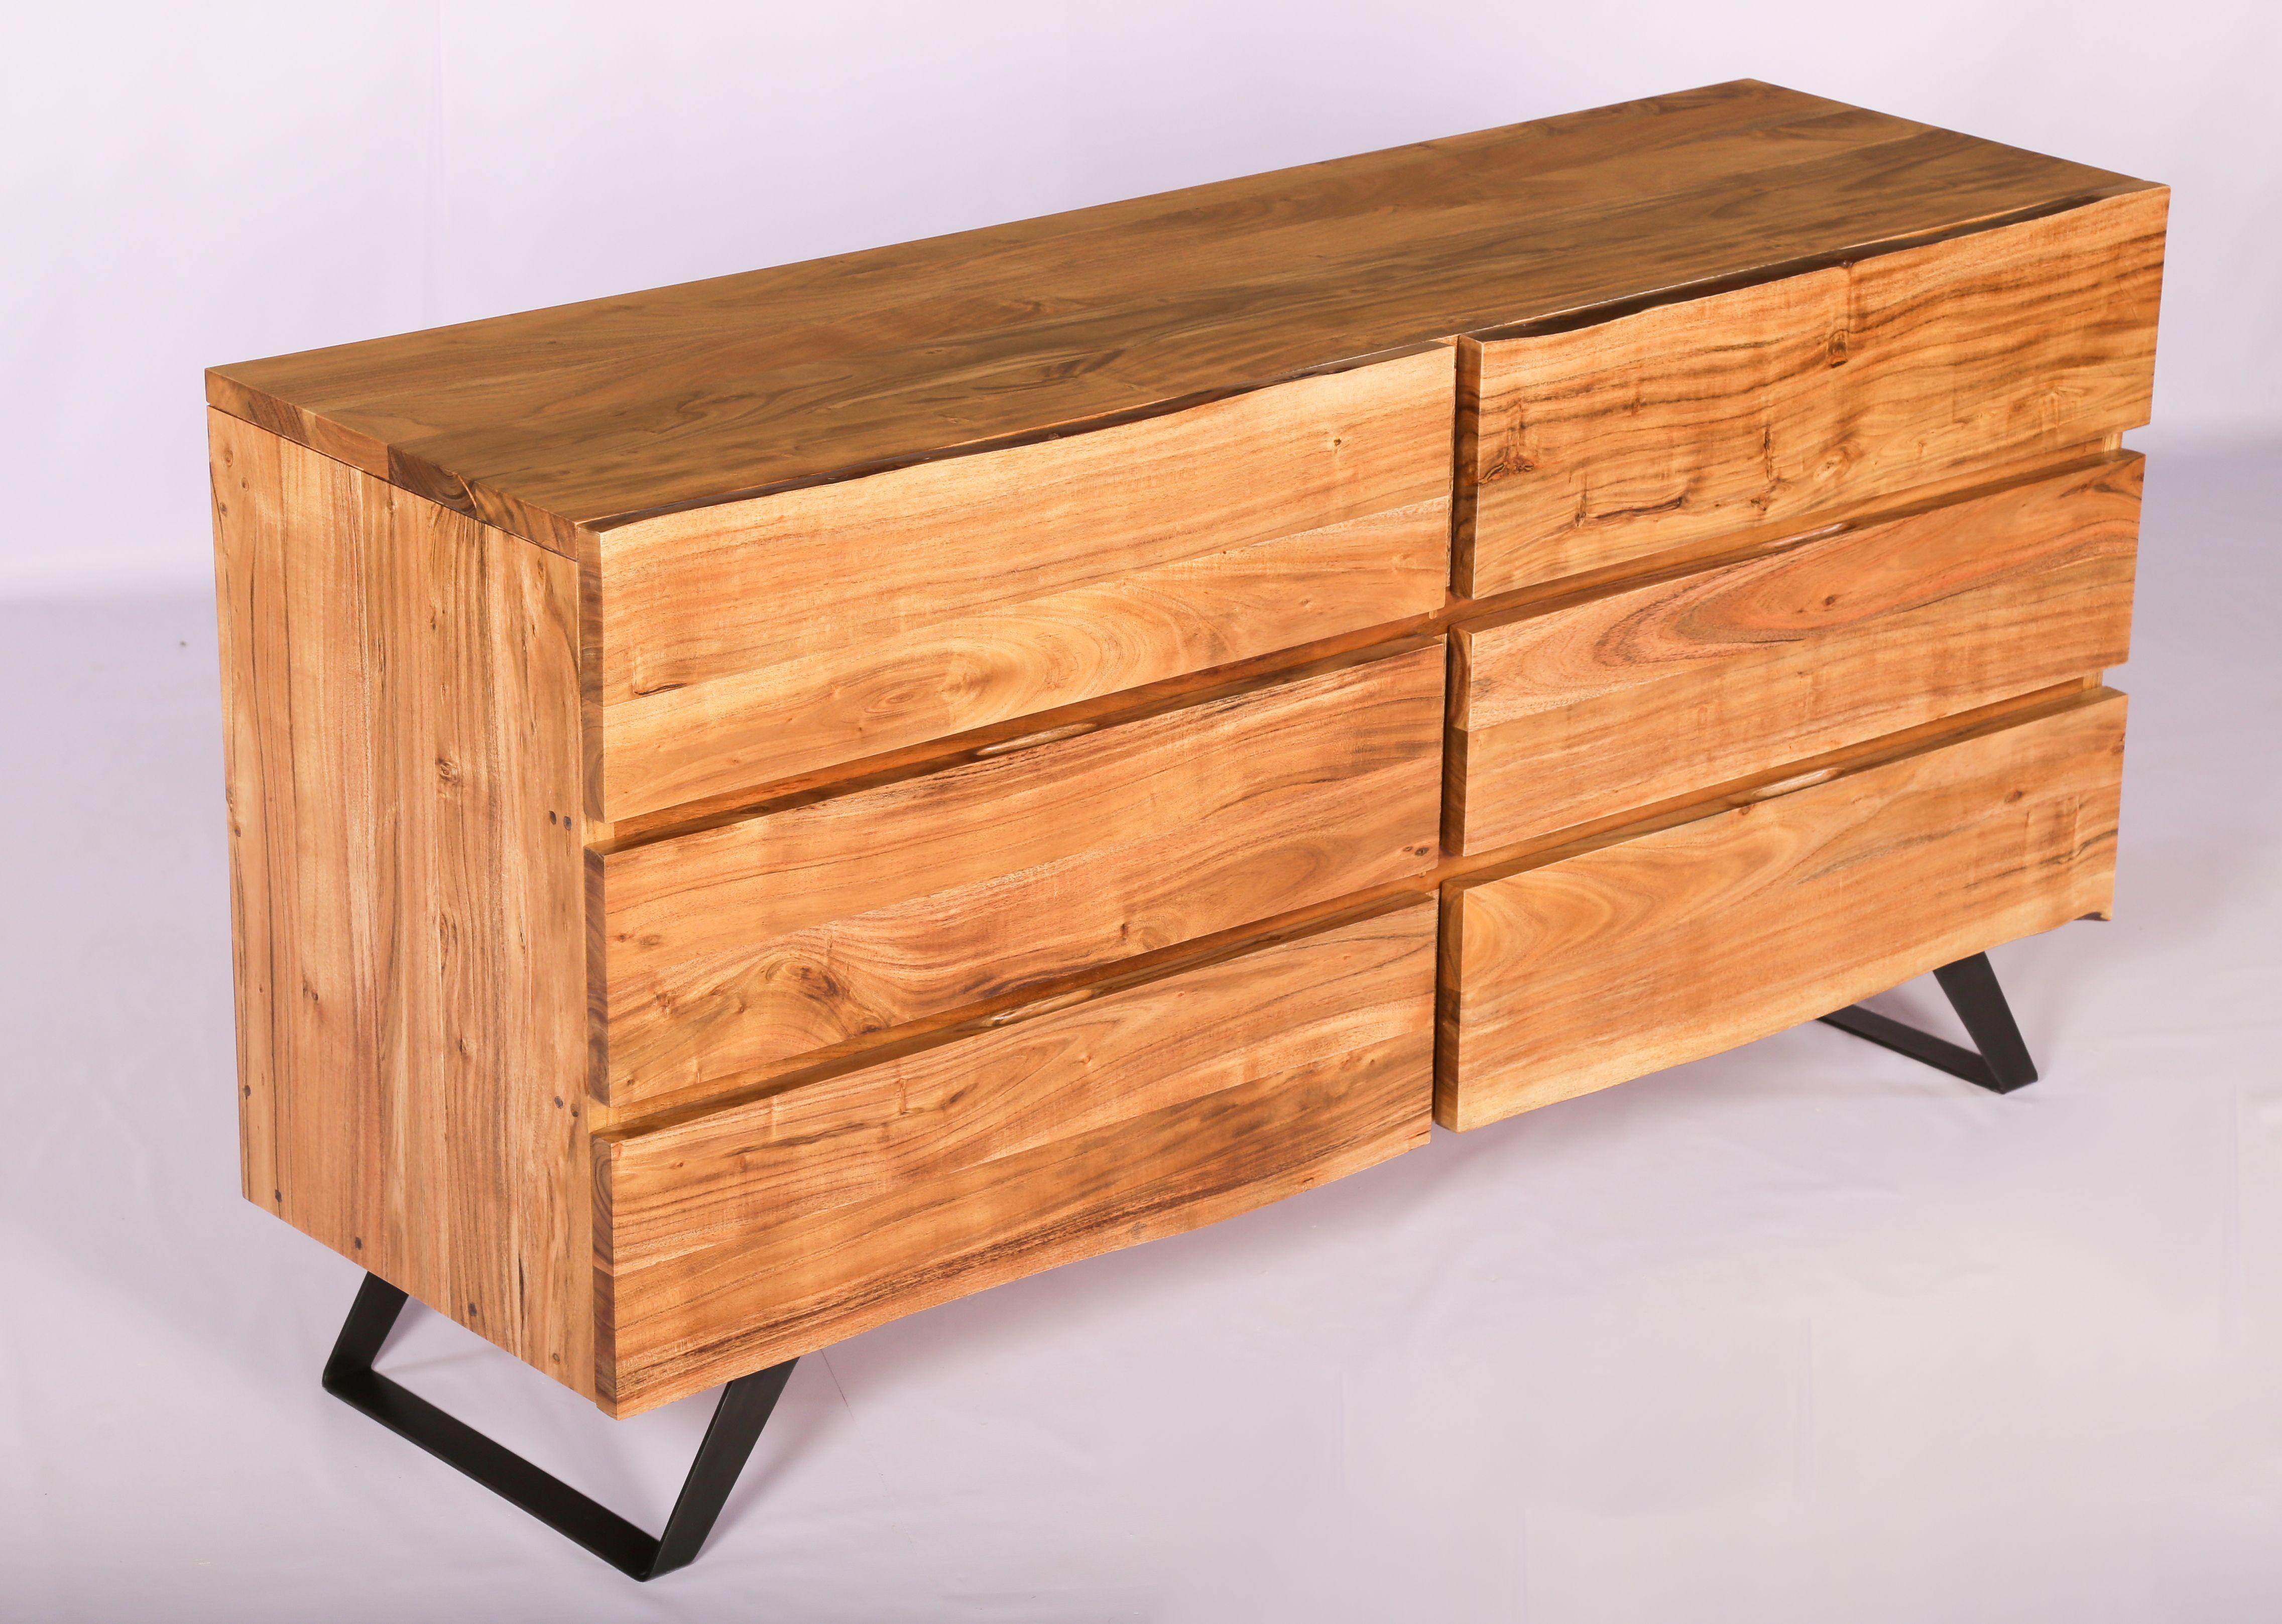 Acacia Wood Iron Base Dresser Wood Dresser Acacia Wood Wood